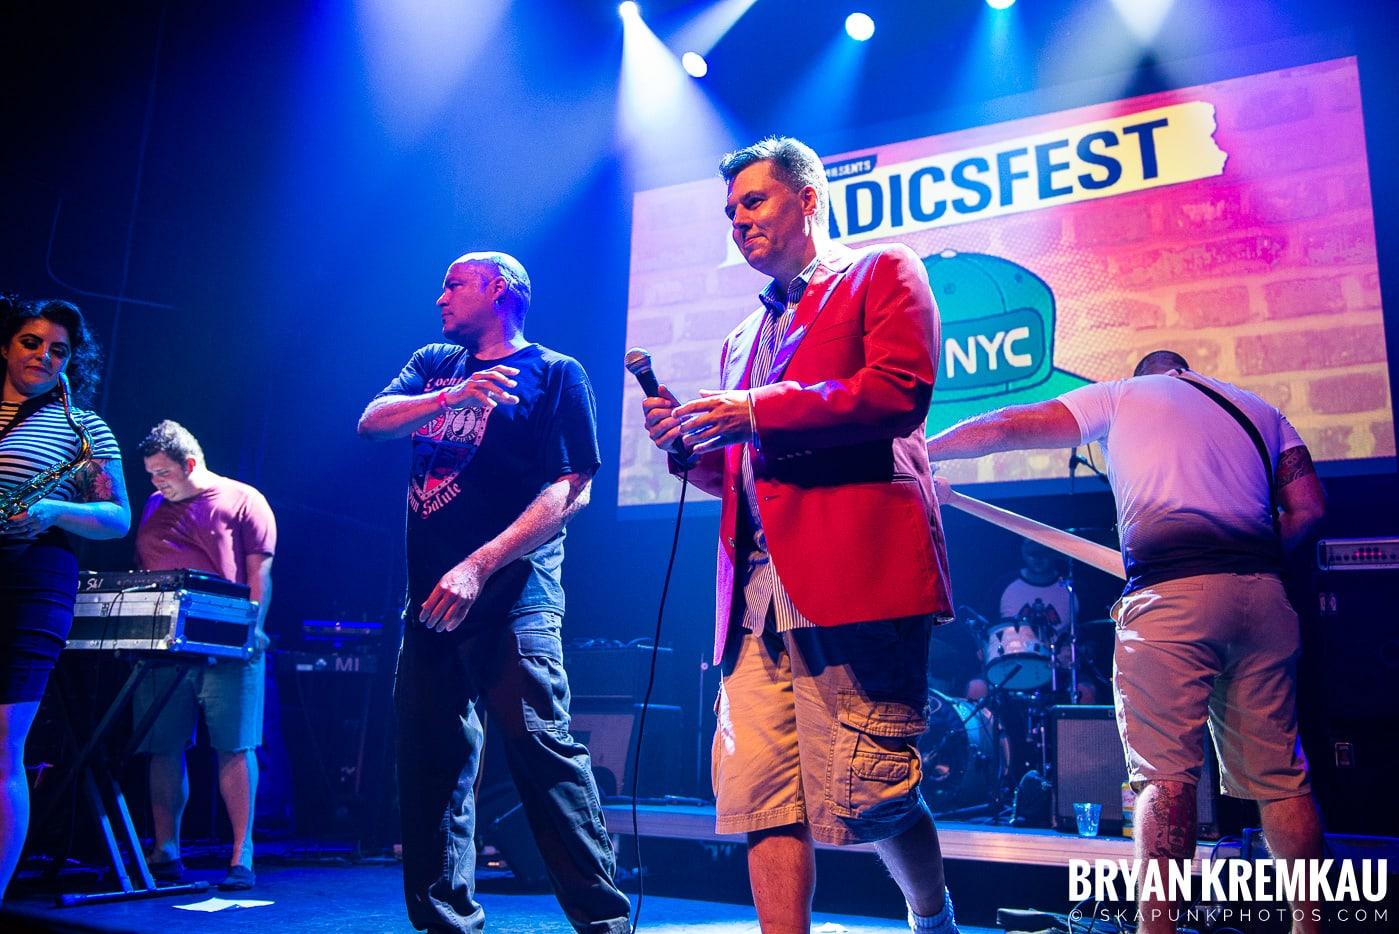 Hub City Stompers @ Radicsfest, Gramercy Theatre, NYC - 7.19.19 (11)